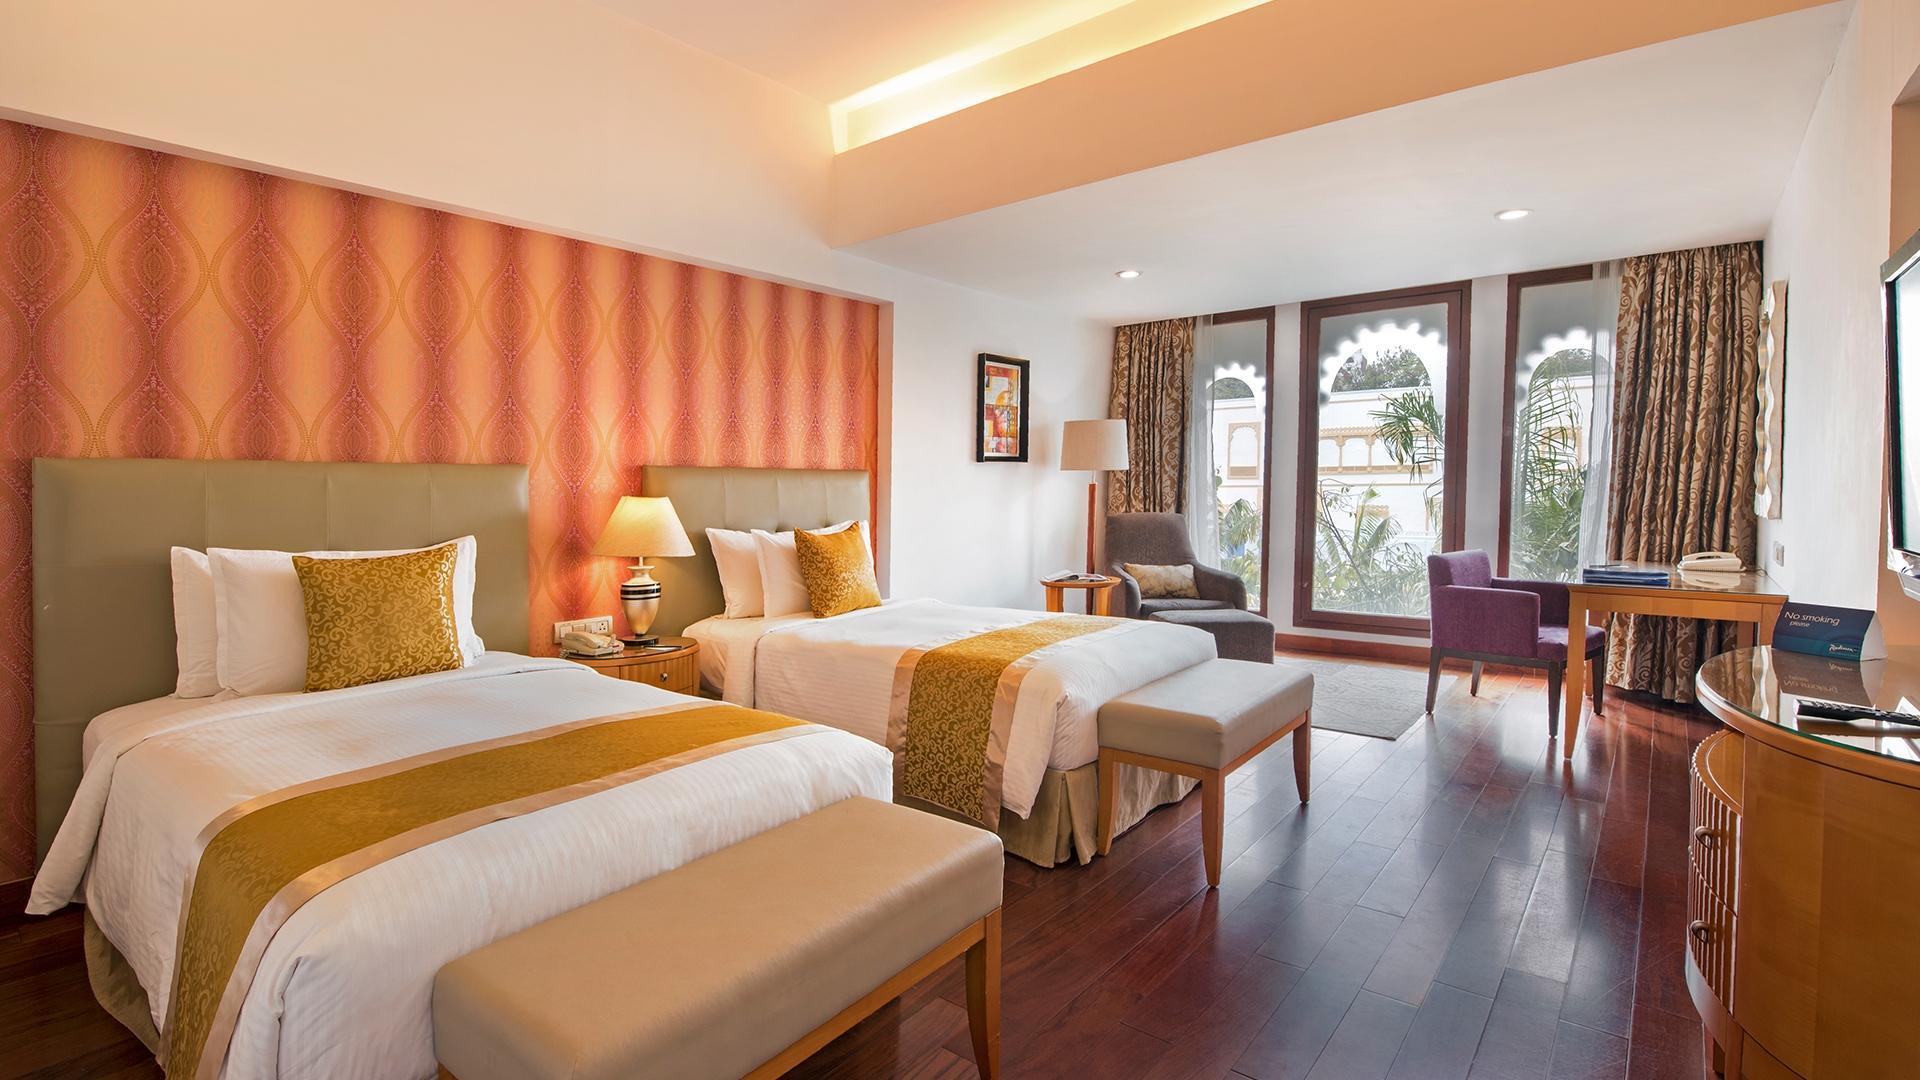 Superior Room image 1 at Radisson Blu Udaipur Palace Resort and Spa by Udaipur, Rajasthan, India